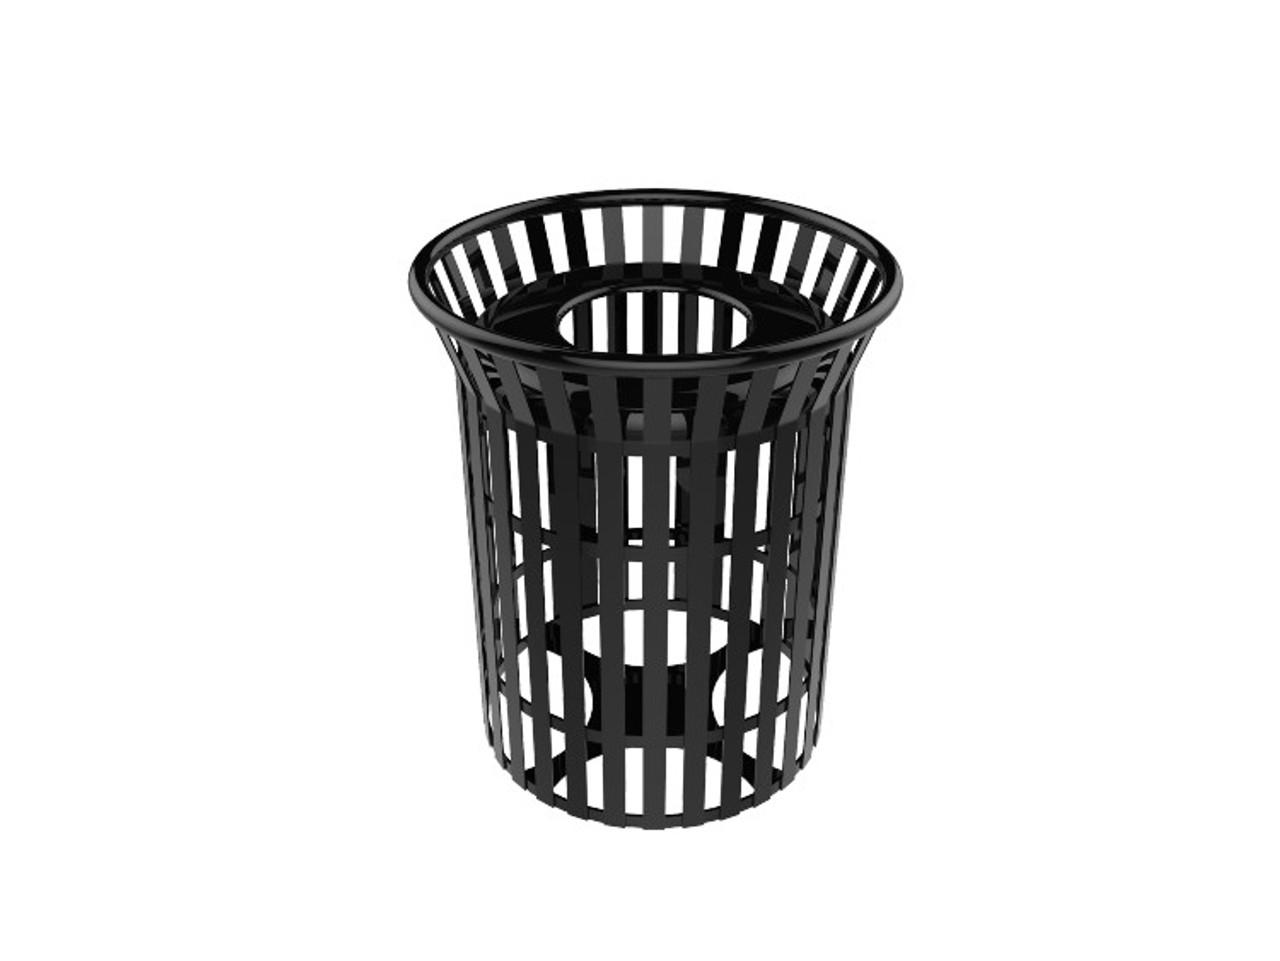 32 Gallon Steel Slat Trash Can